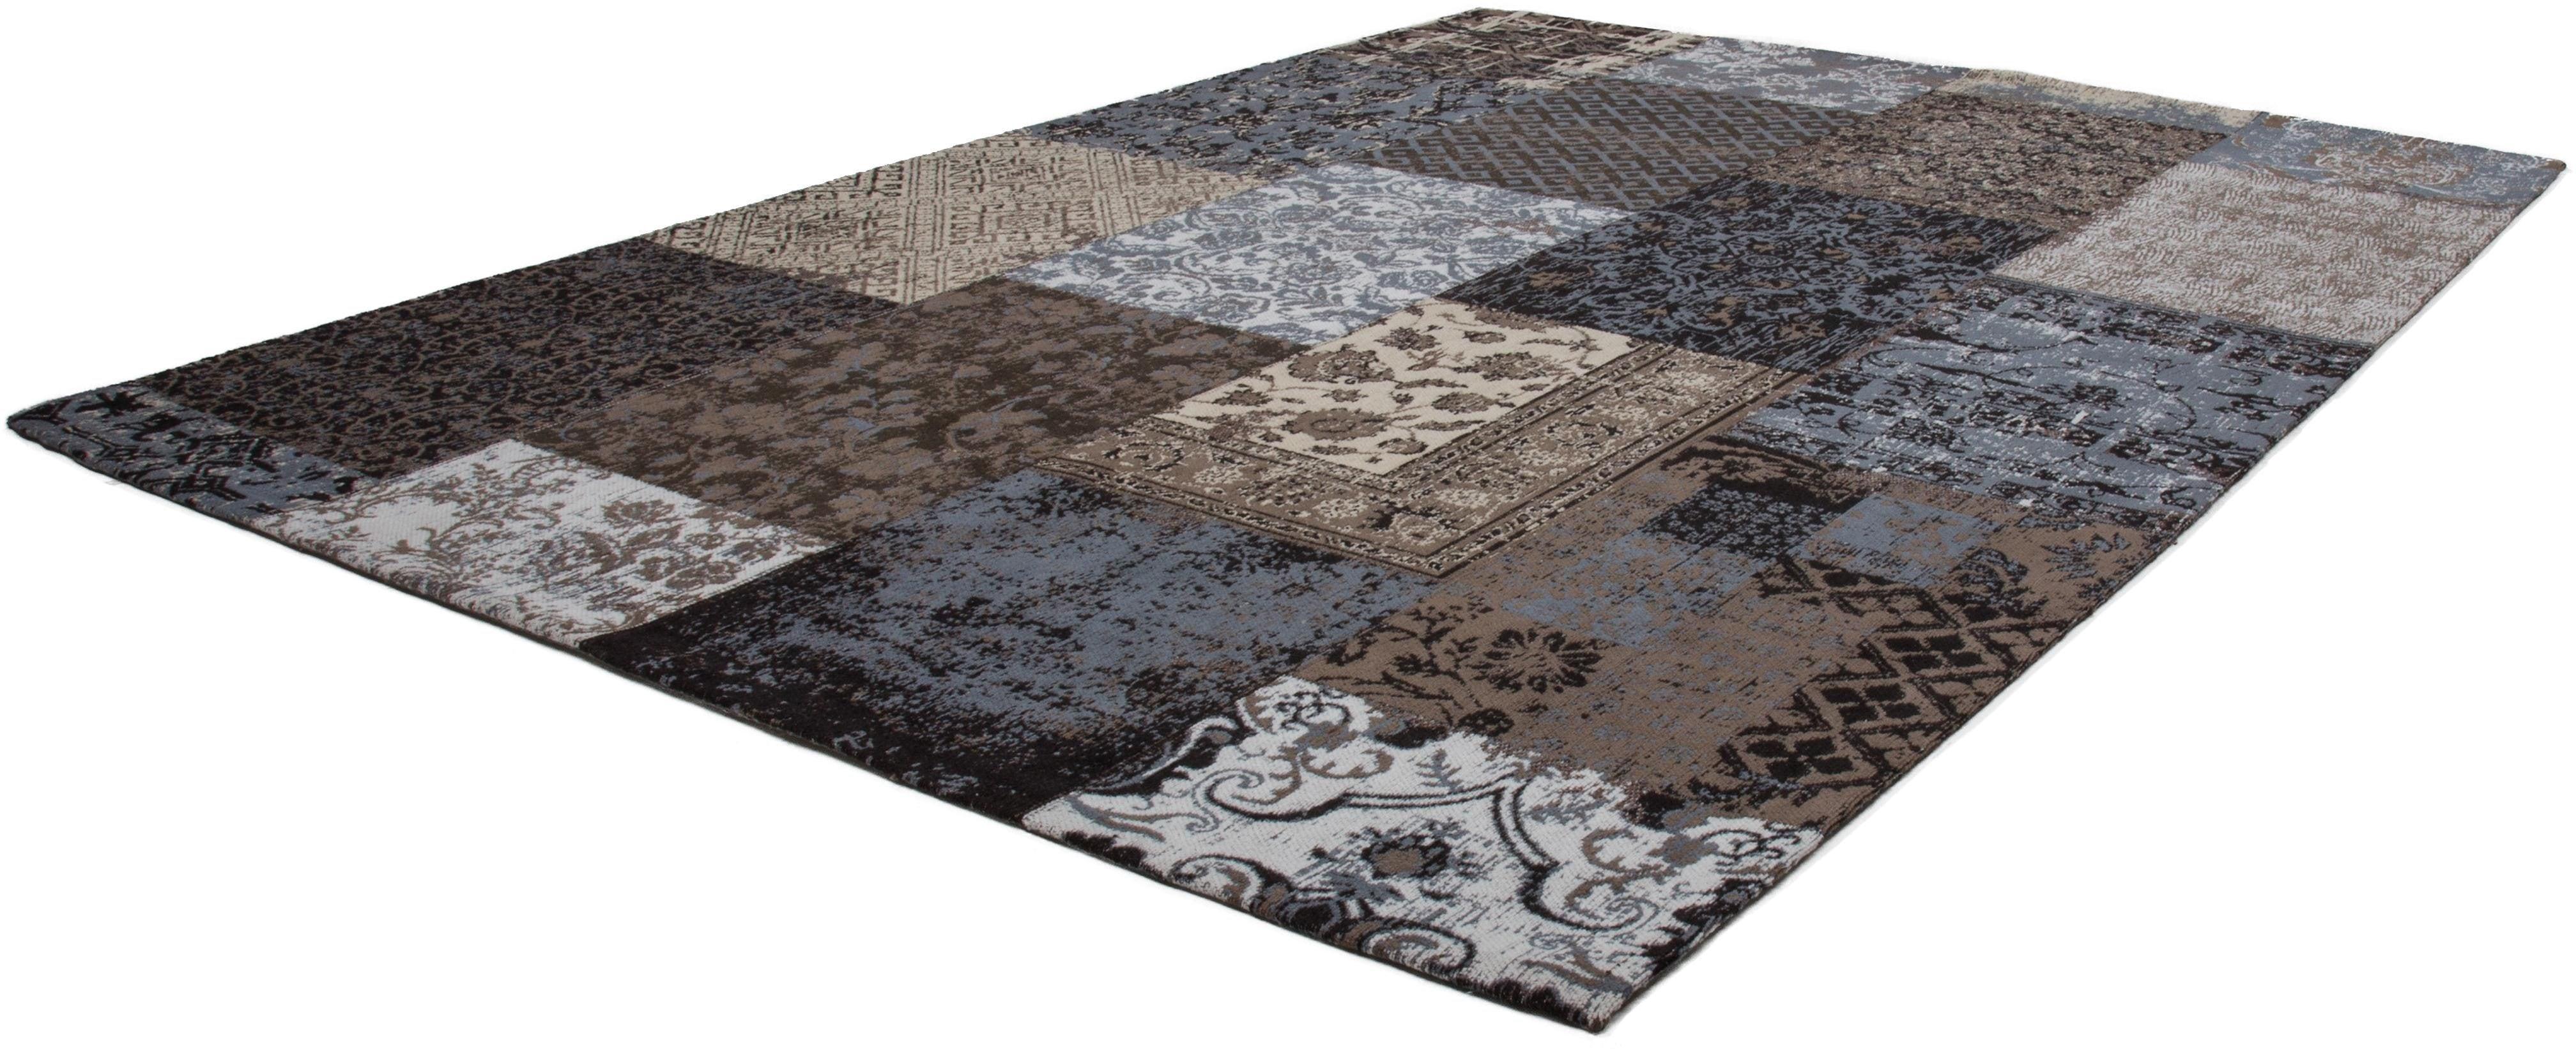 Teppich Symphony 160 Kayoom rechteckig Höhe 8 mm handgewebt